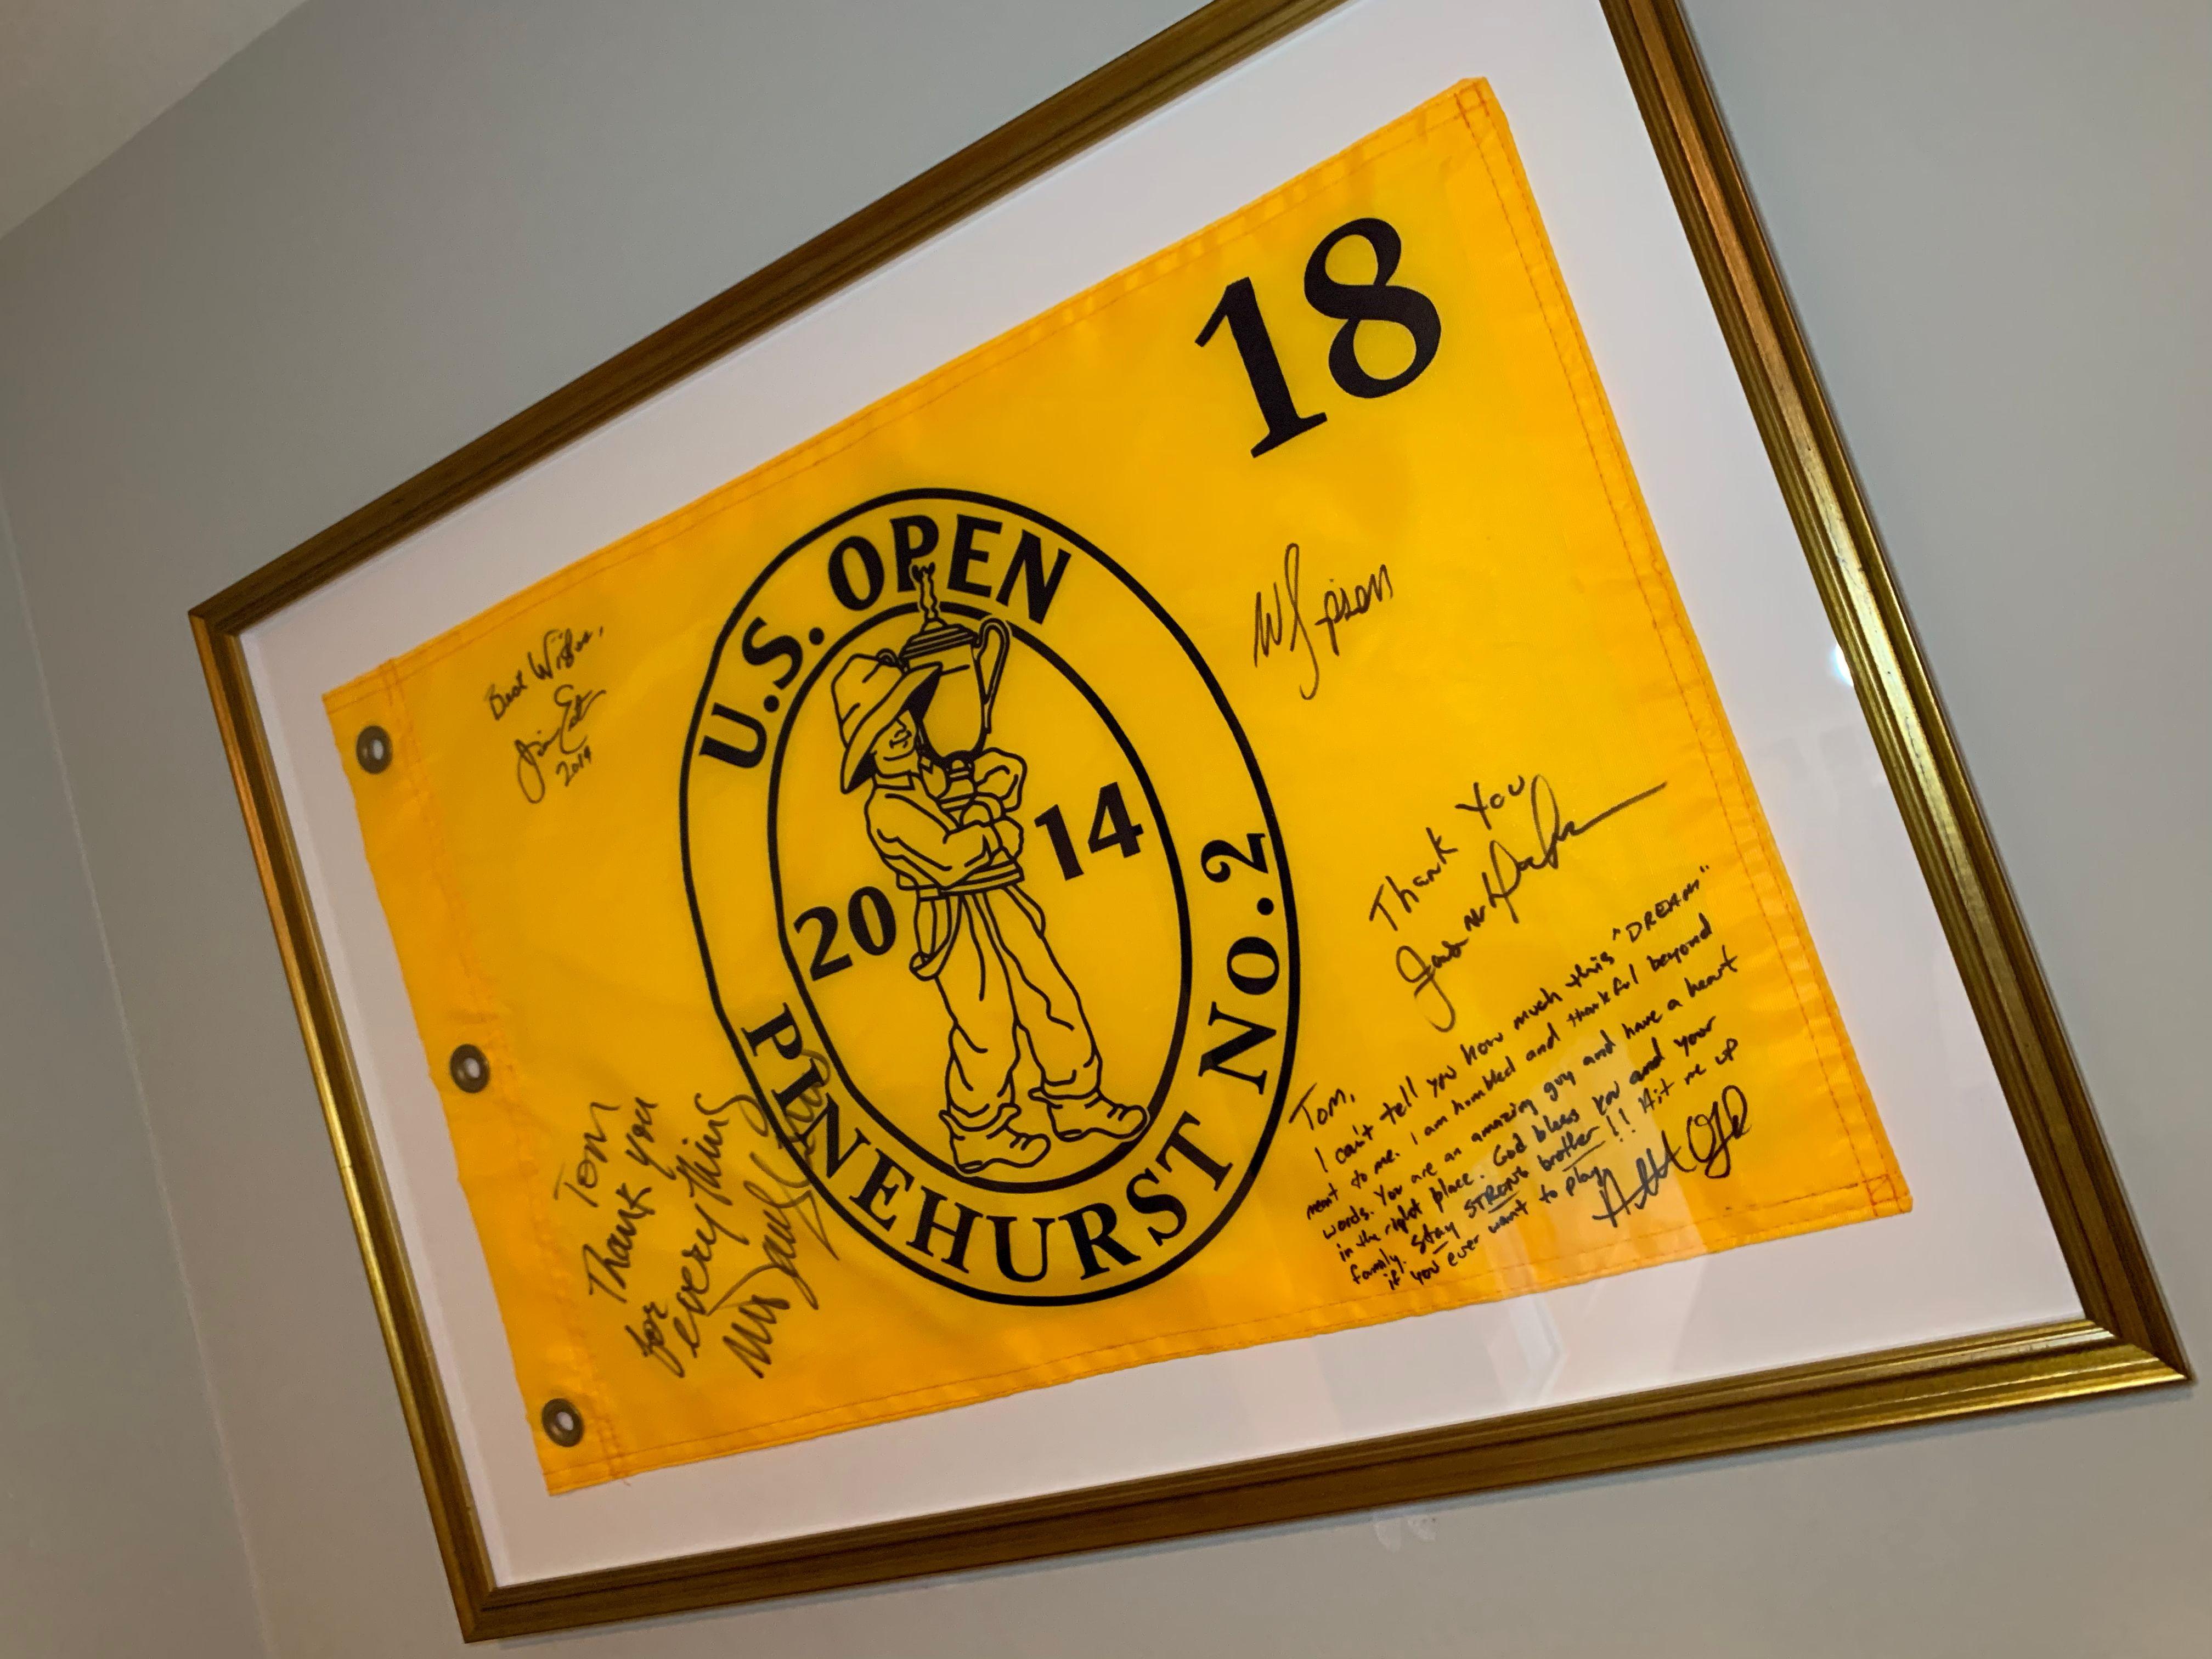 signed golf flag in frame